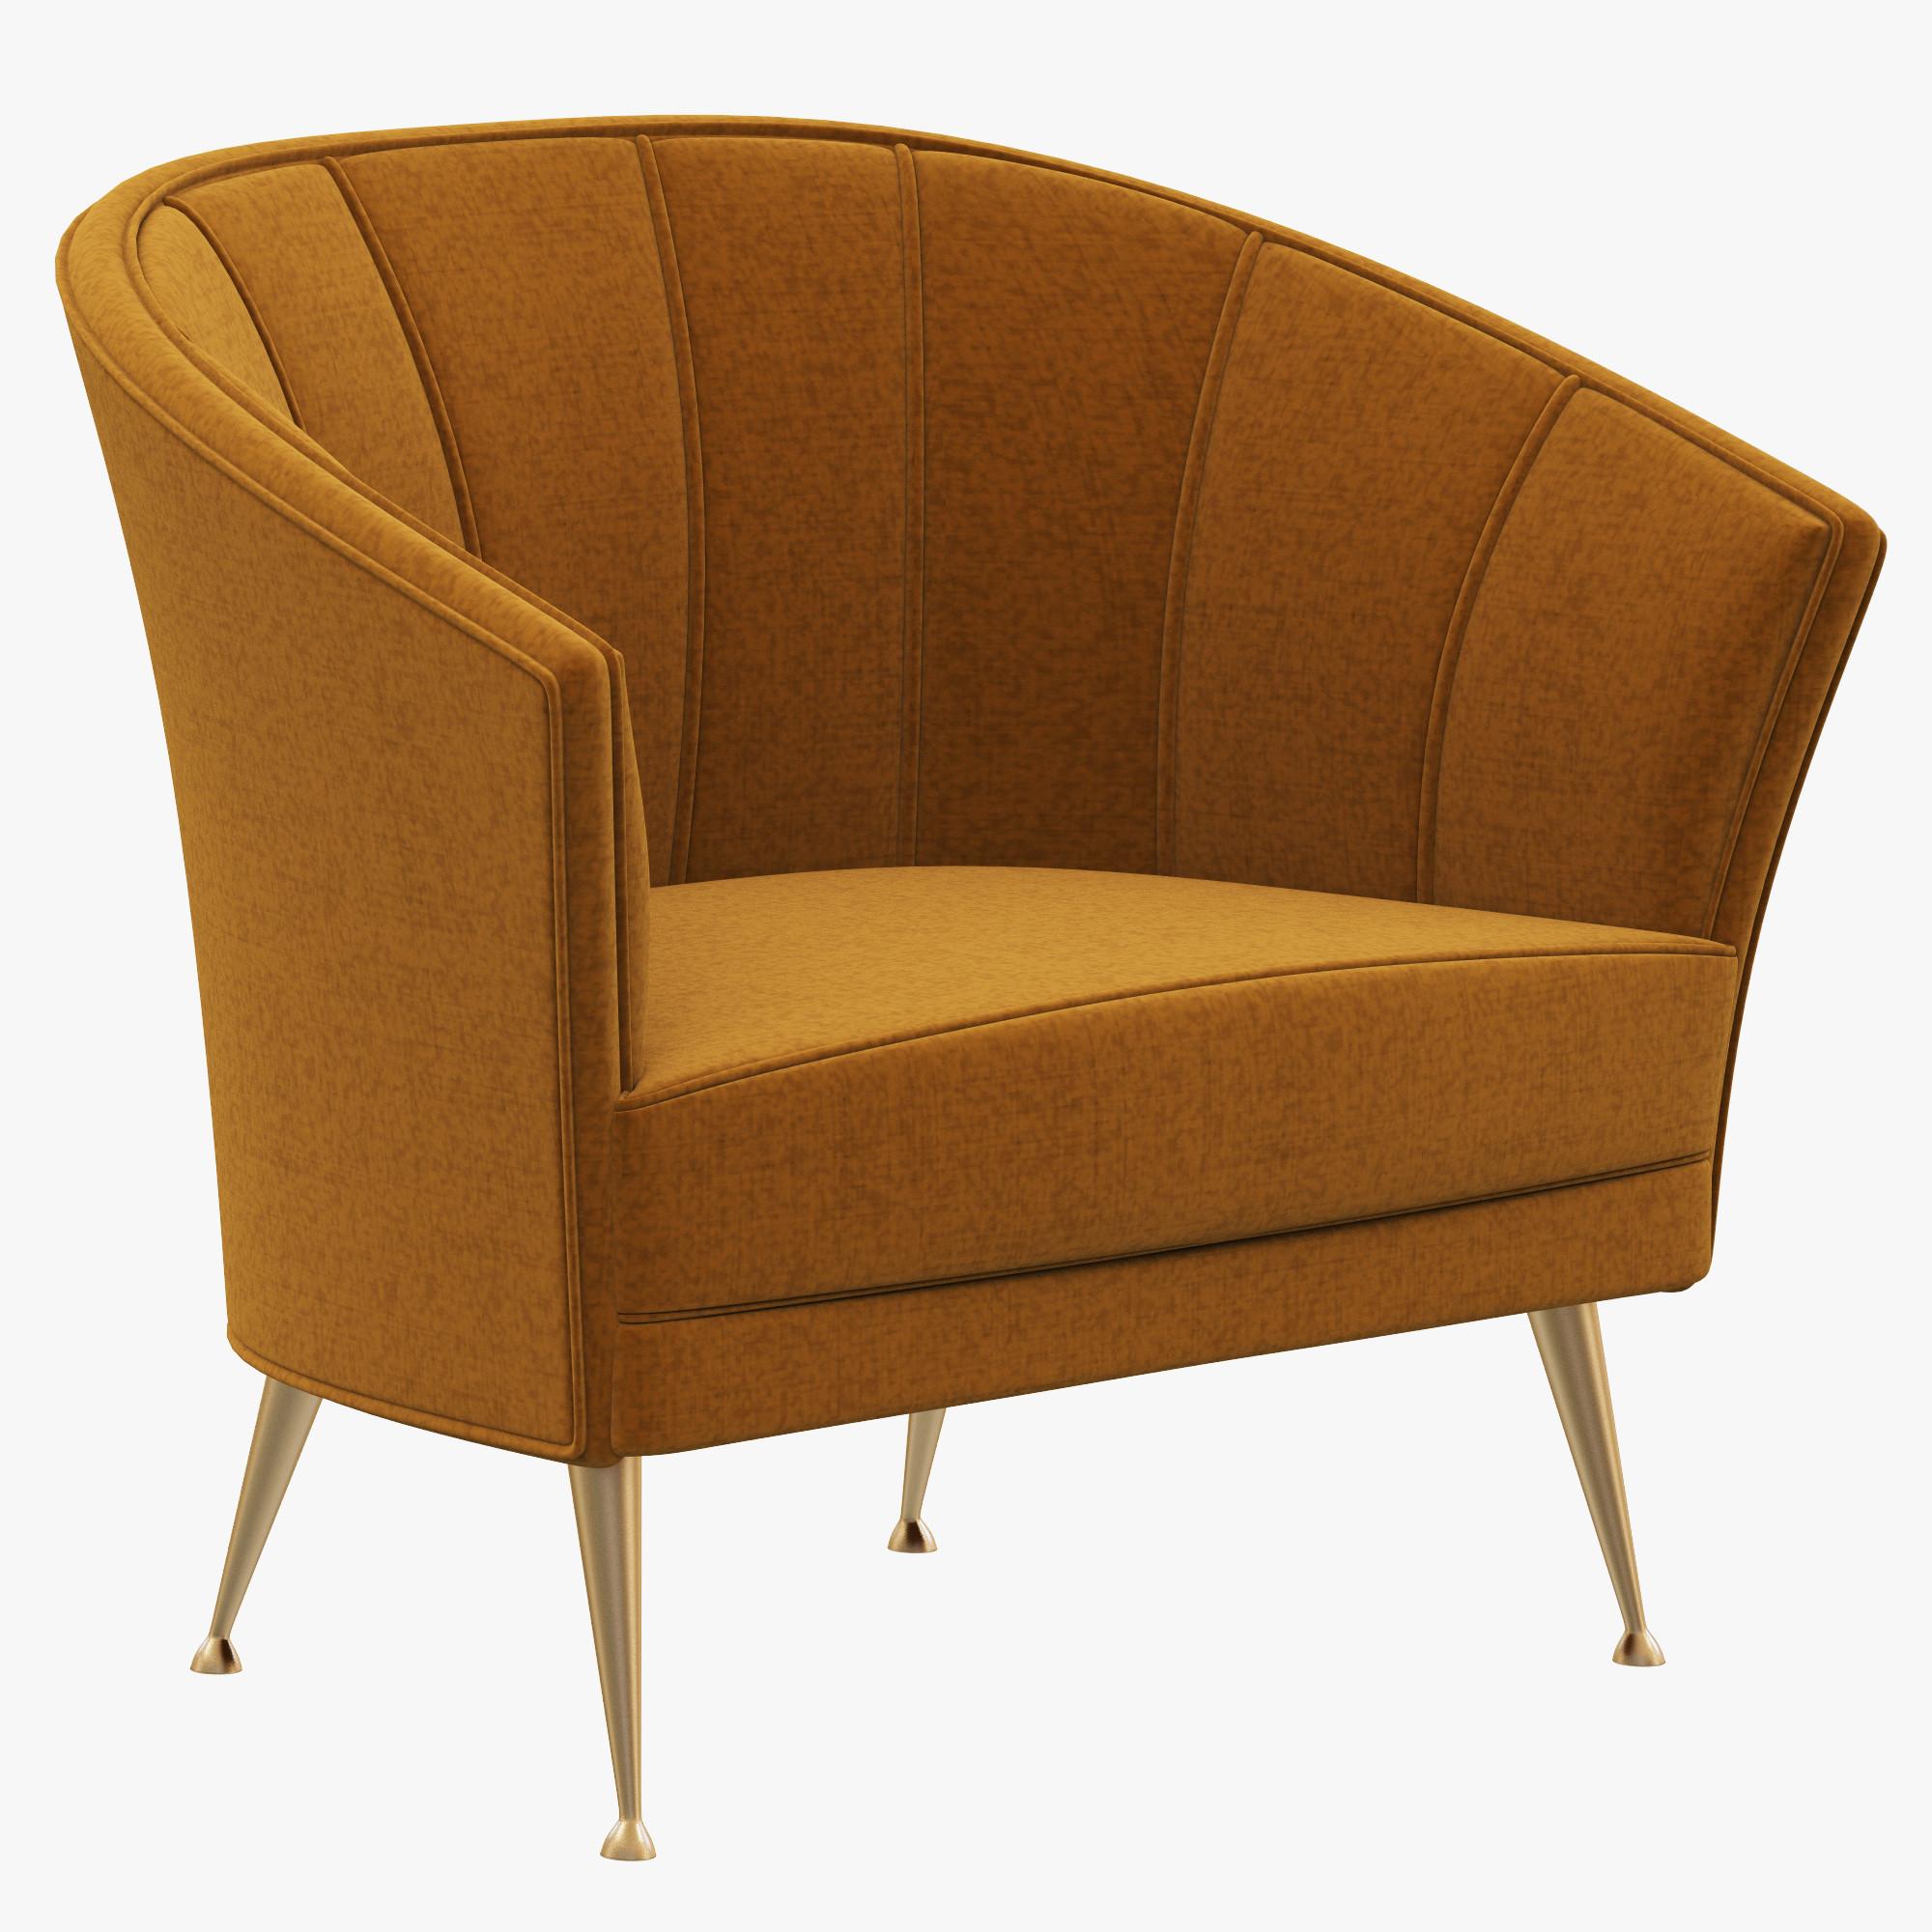 Brabbu armchair chair 3d max for Chair 3d model maya